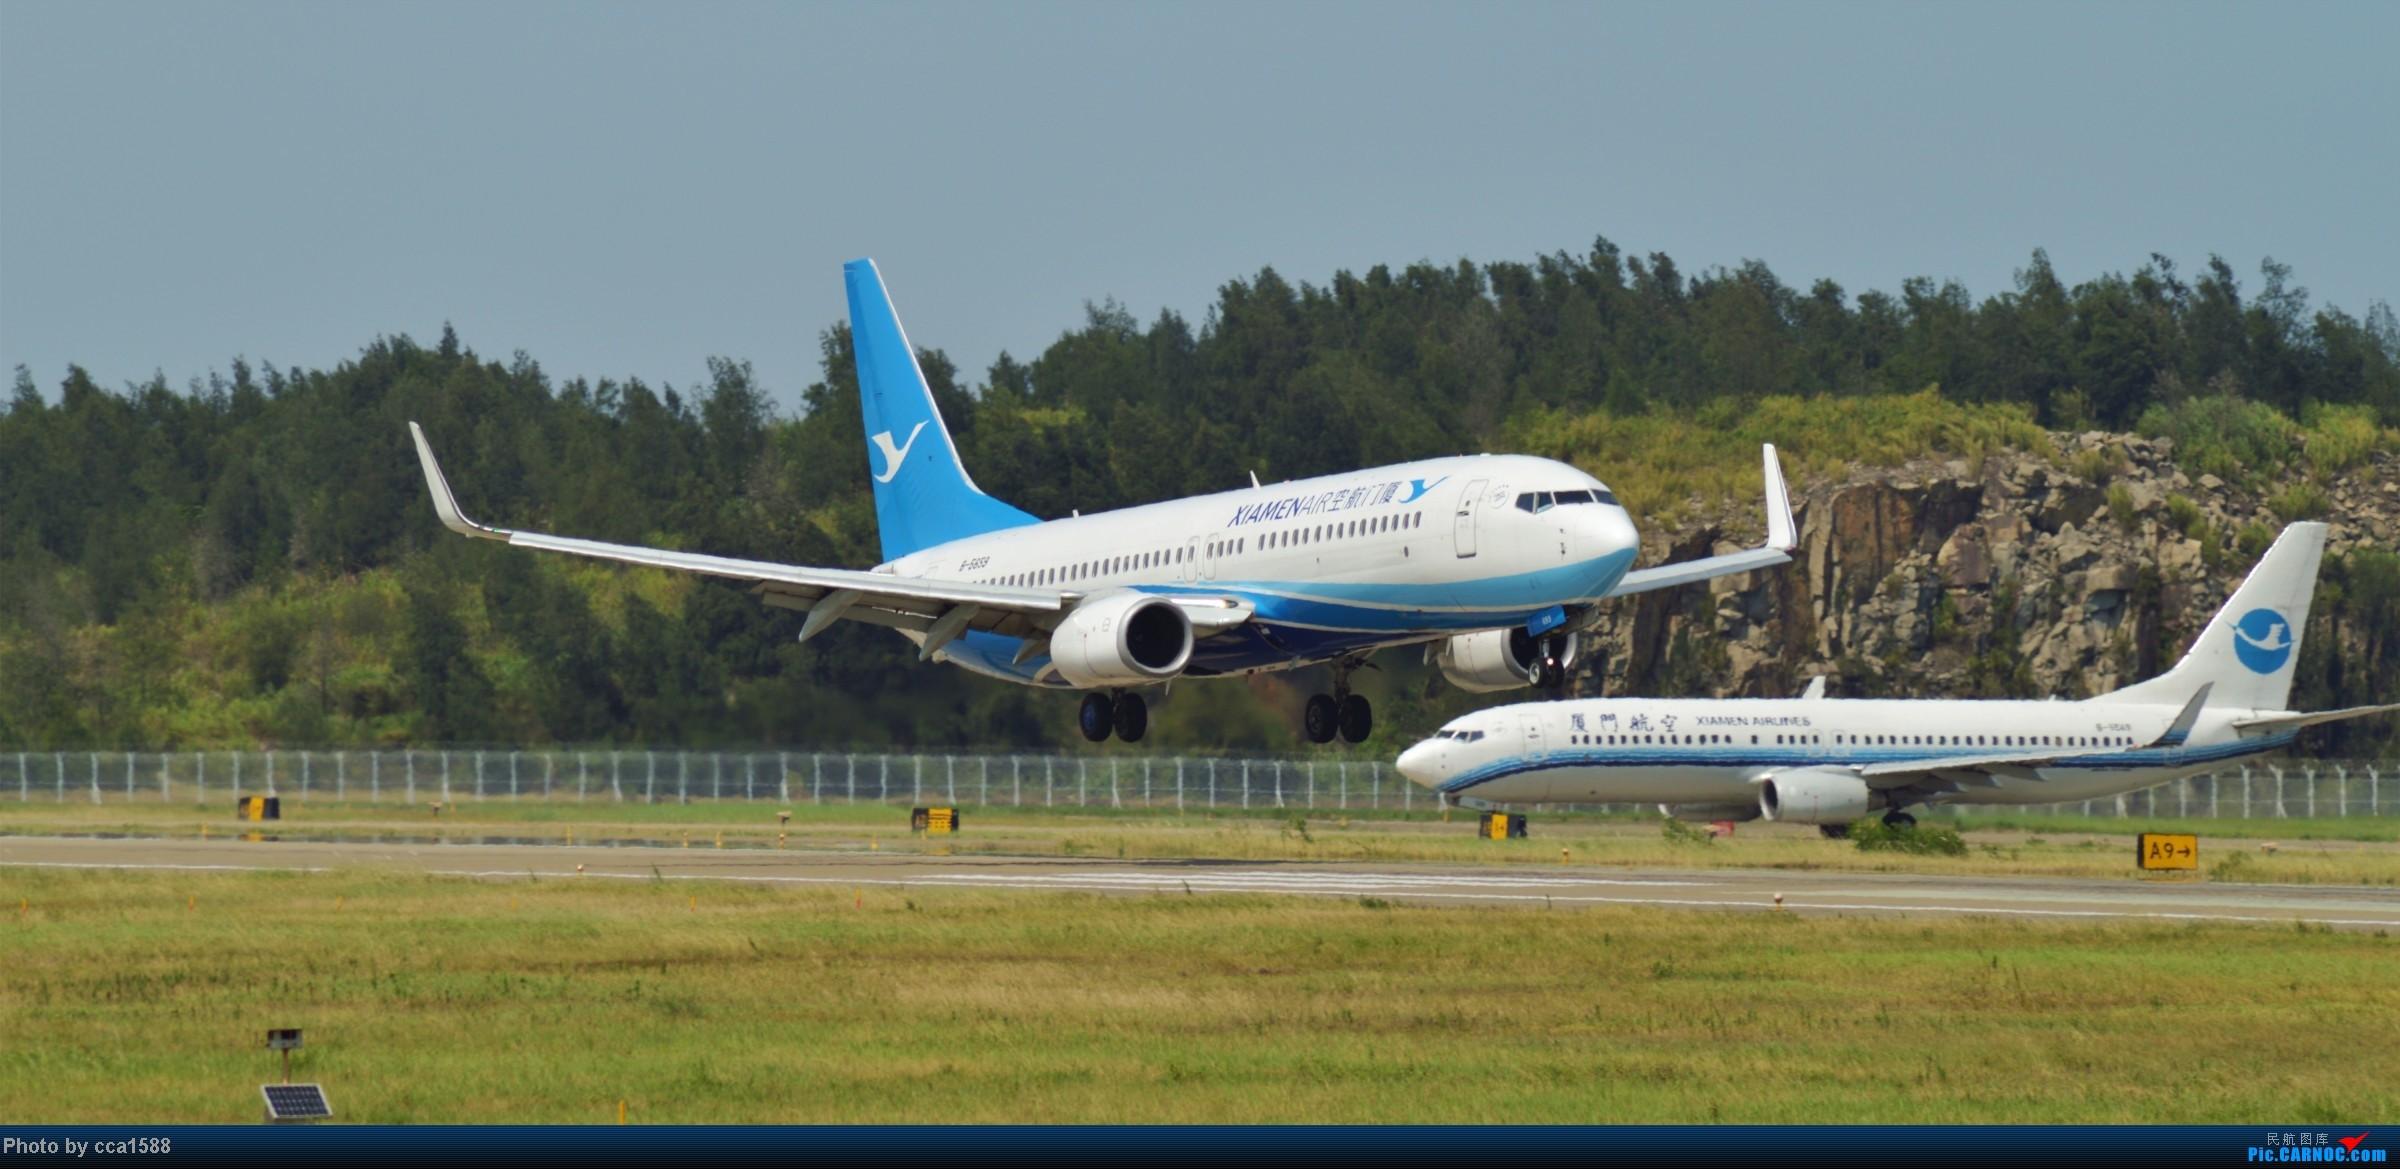 Re:[原创]7.25--FOC拍机集锦~(复兴、新舟60、还有更多惊喜~!) BOEING 737-800 B-5659 中国福州长乐机场